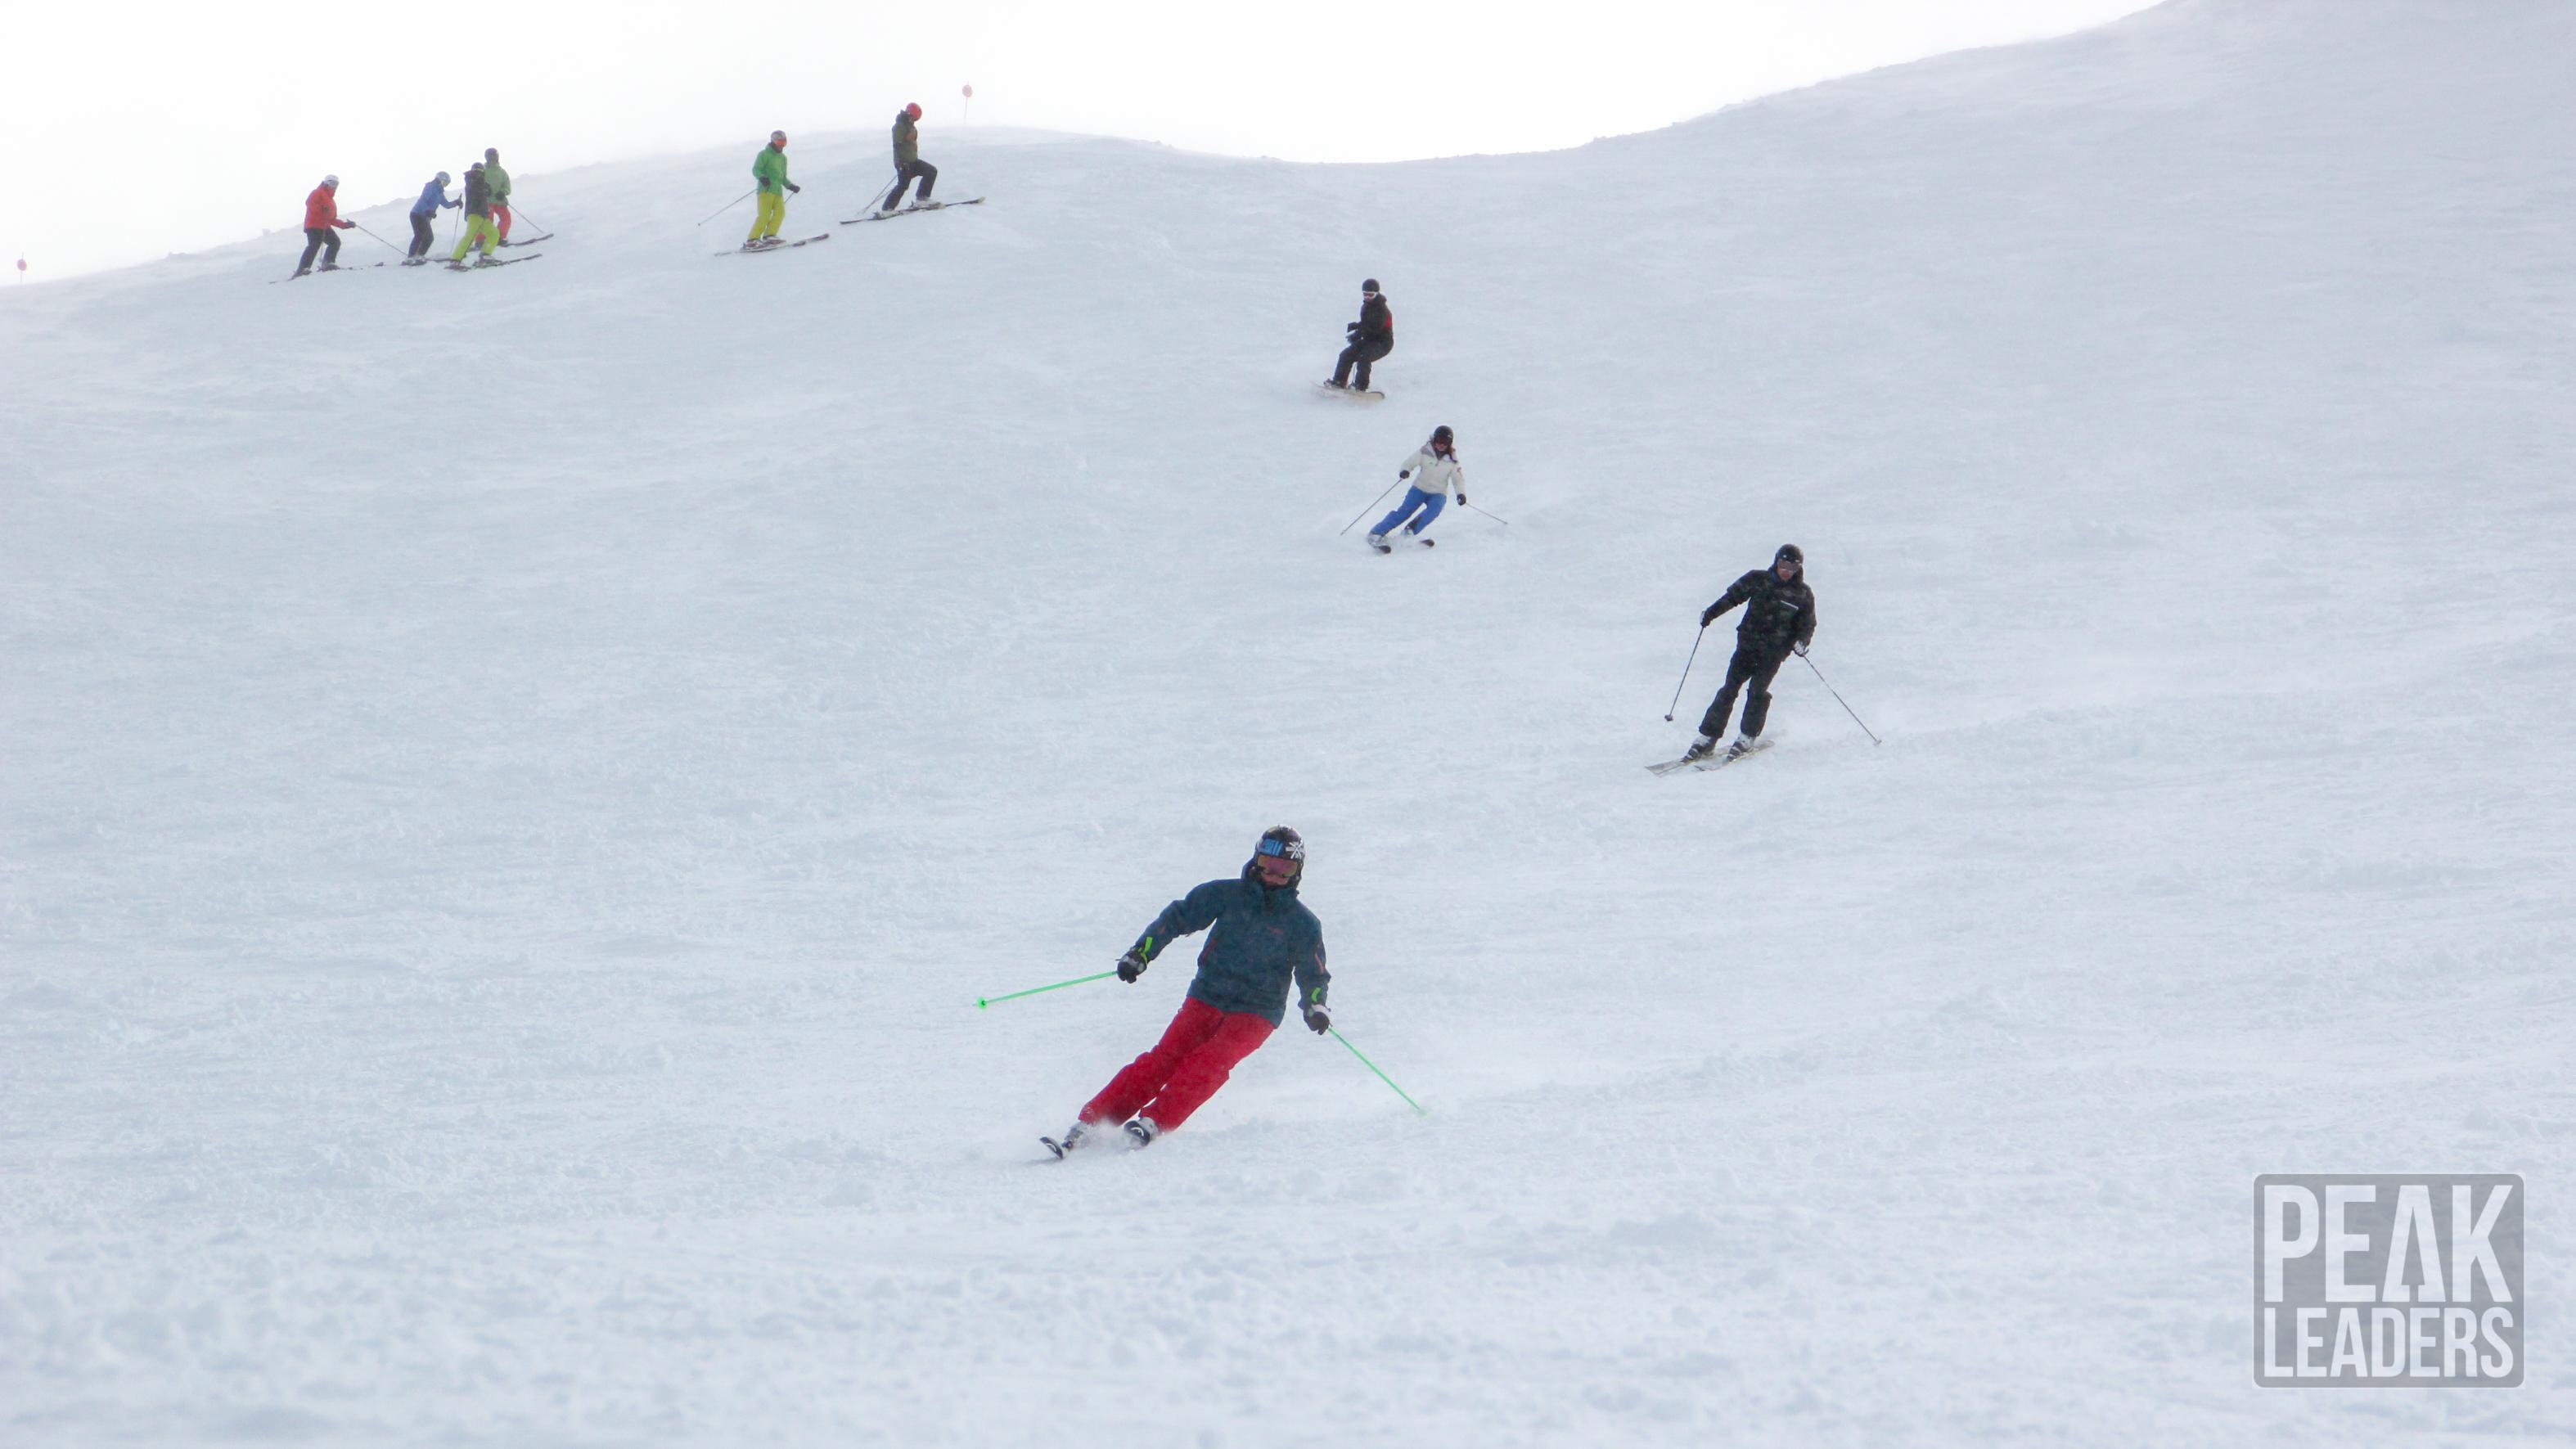 Ski Instructor Graduate coming down the slopes, enjoying some fresh pow